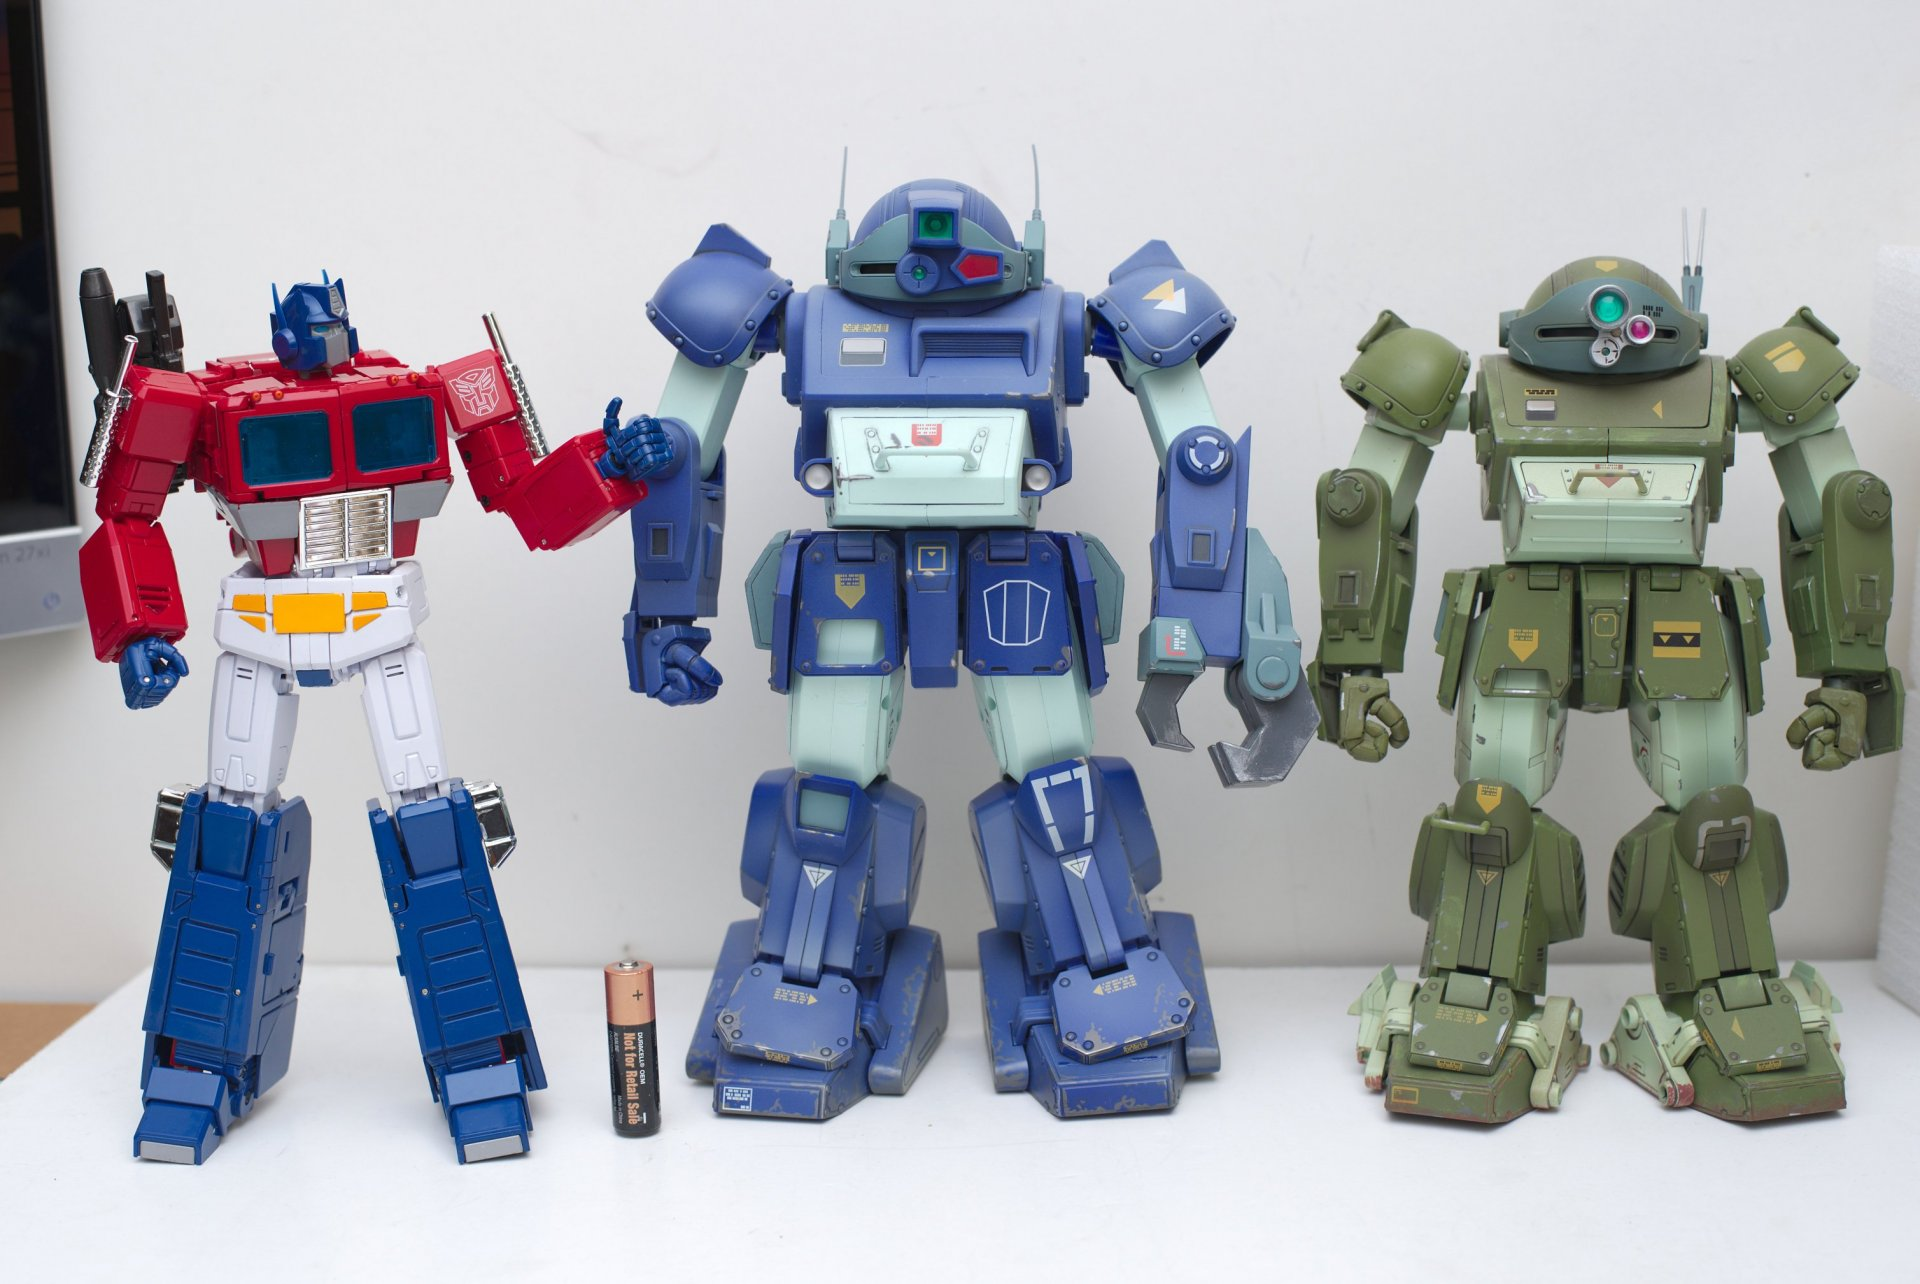 takara-collectible-toys.thumb.jpg.3fcaaa532505c916939295d17d55c3de.jpg